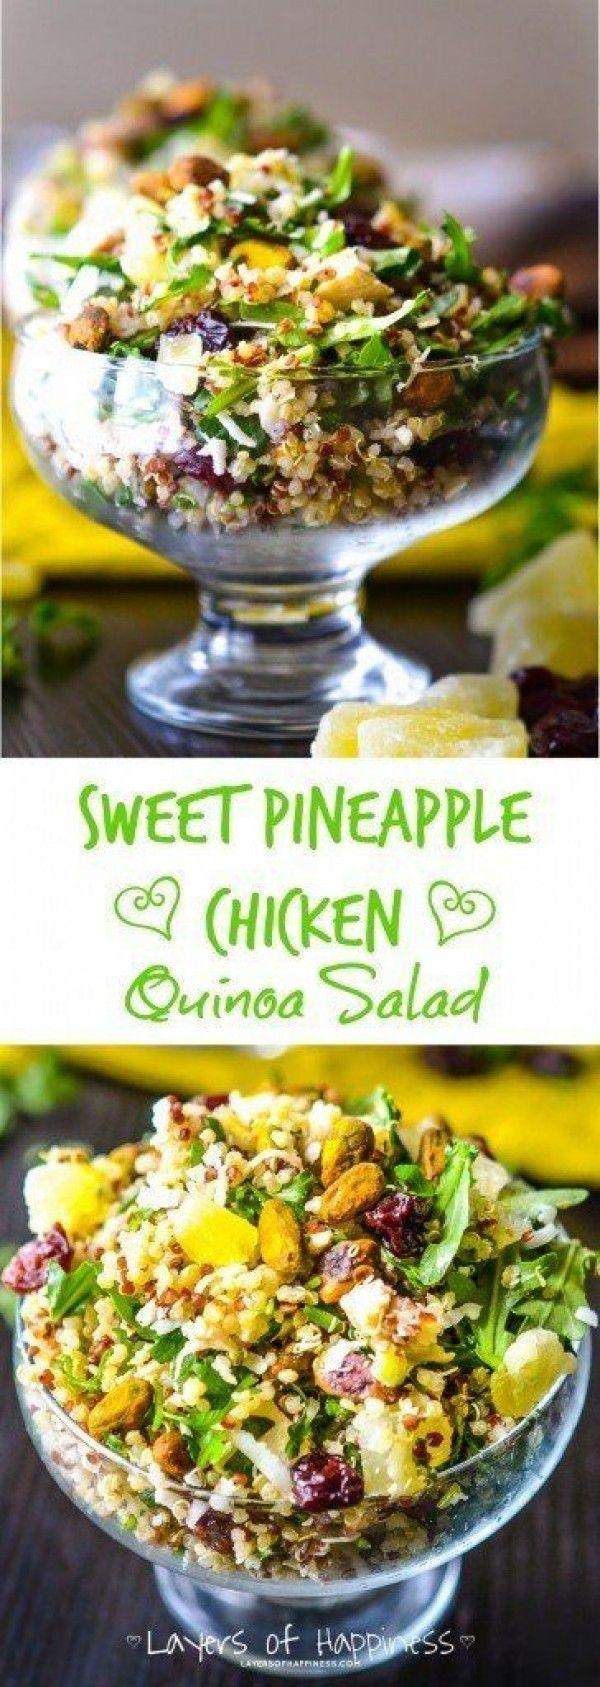 Get the recipe Pineapple Chicken Quinoa Salad @recipes_to_go